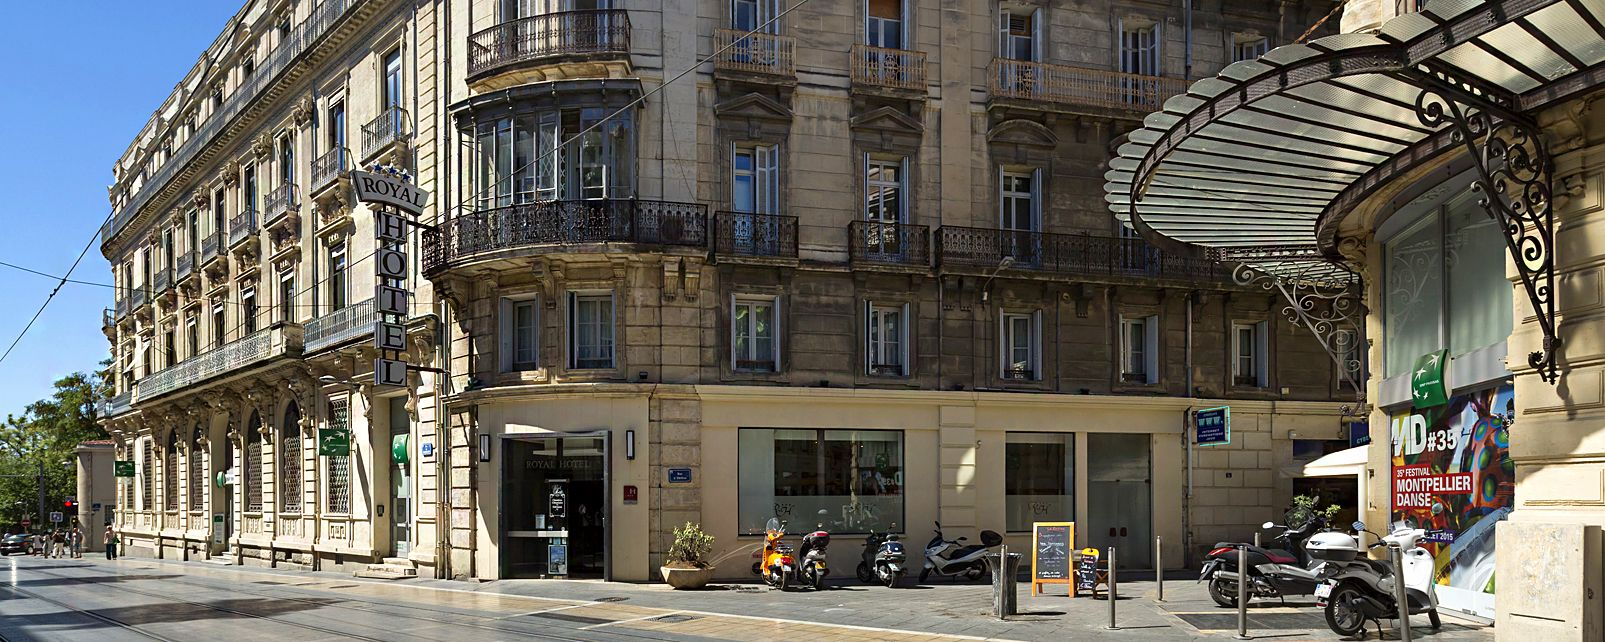 Hôtel Hôtel Royal